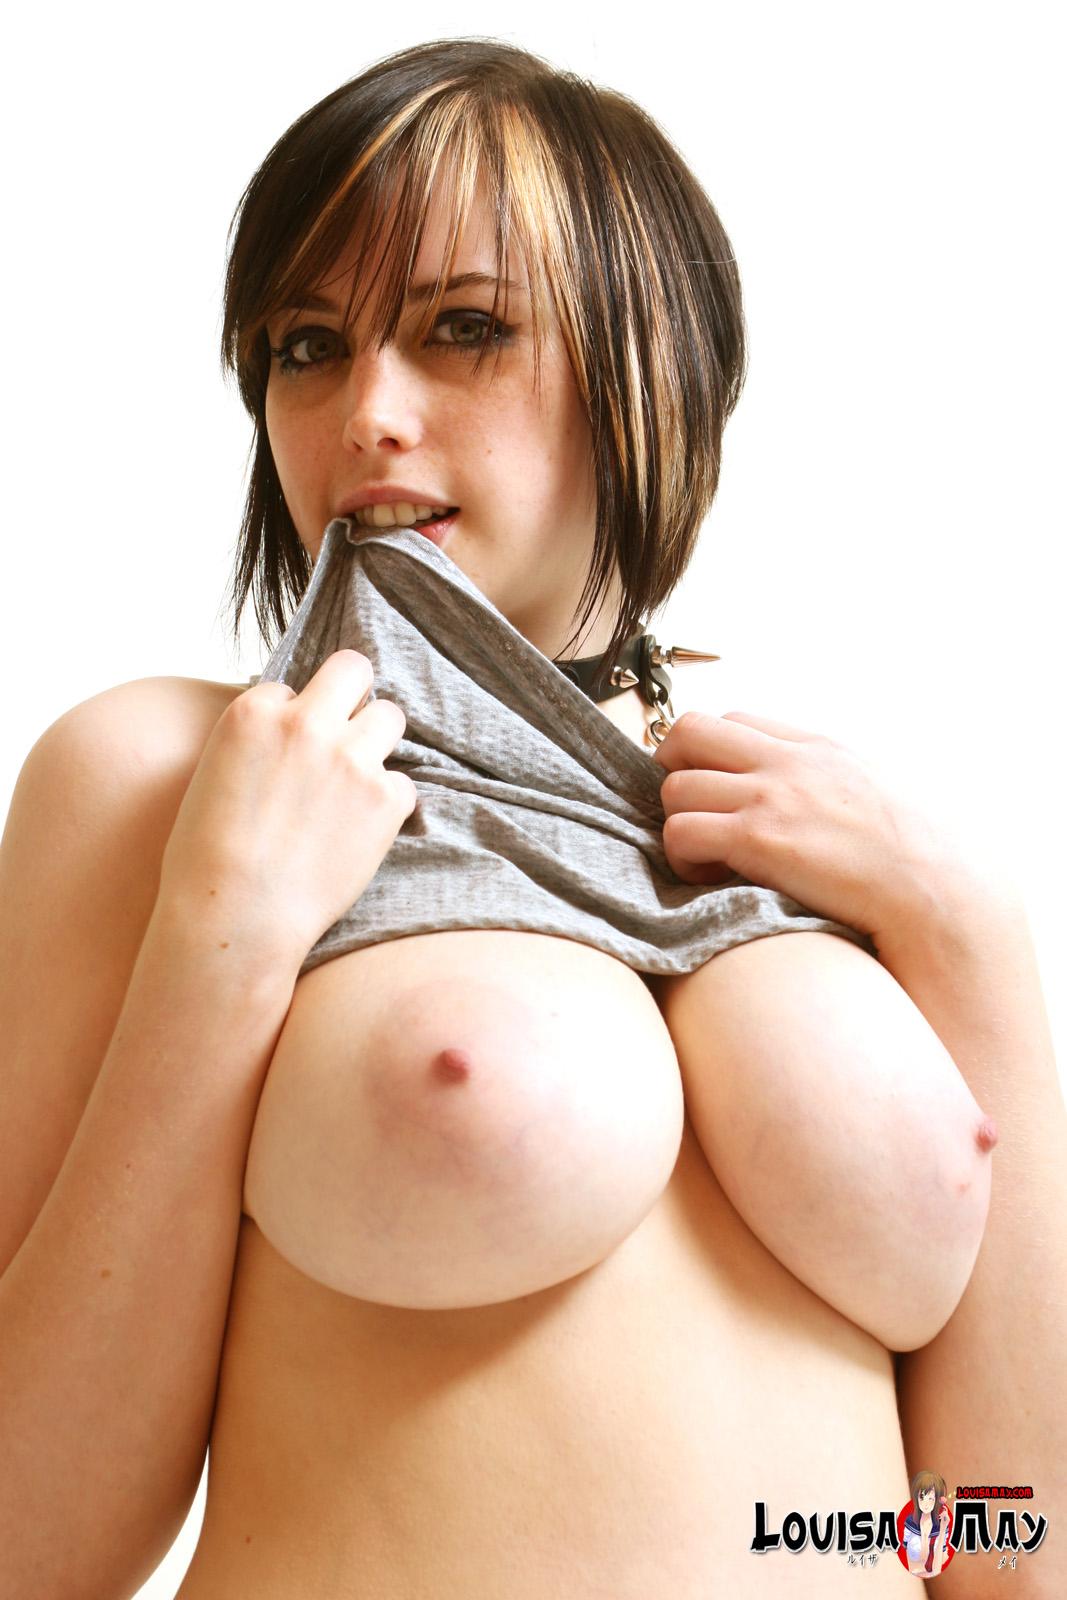 Love jannah nude